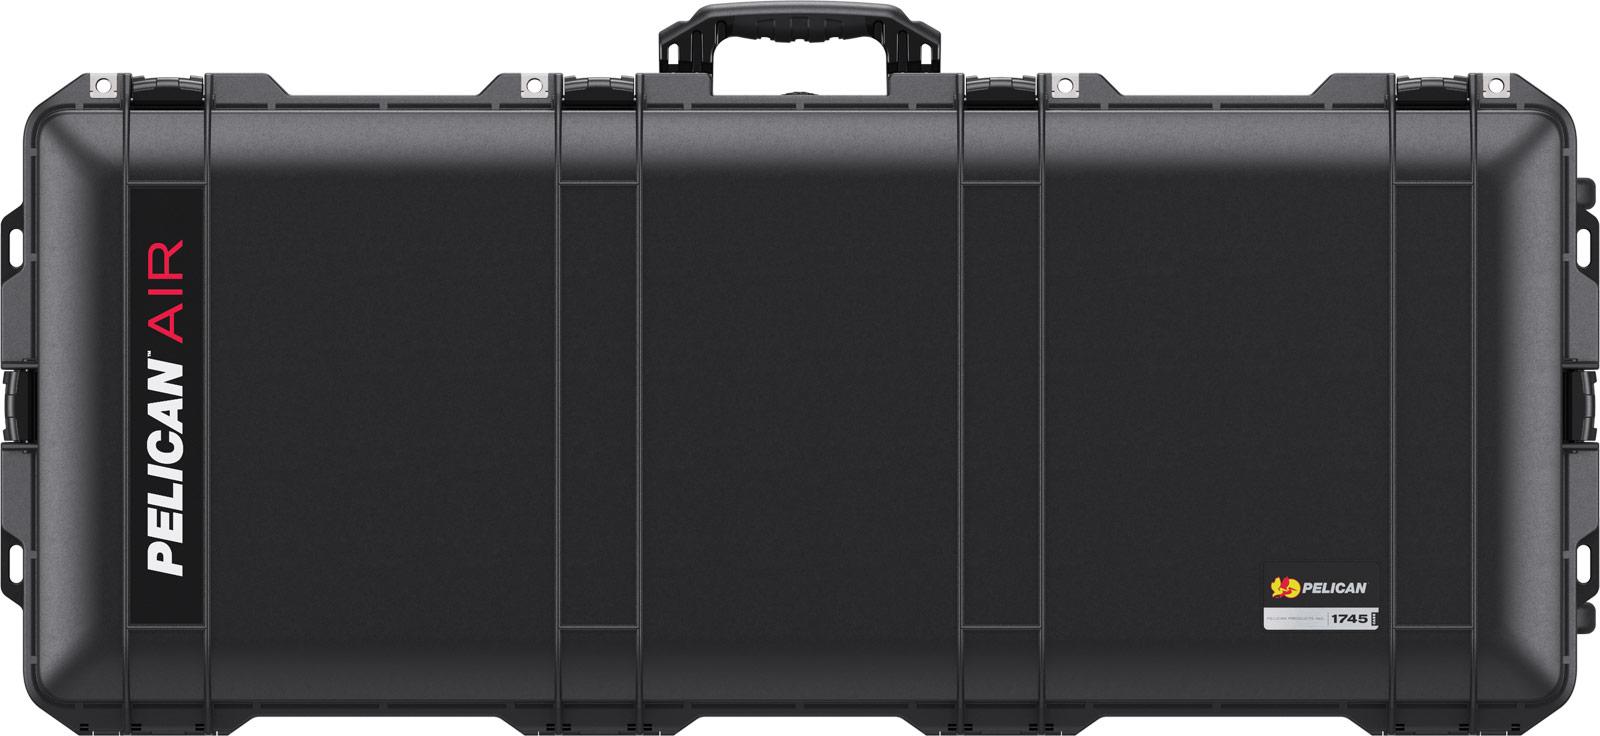 pelican air long case lightweight rifle cases